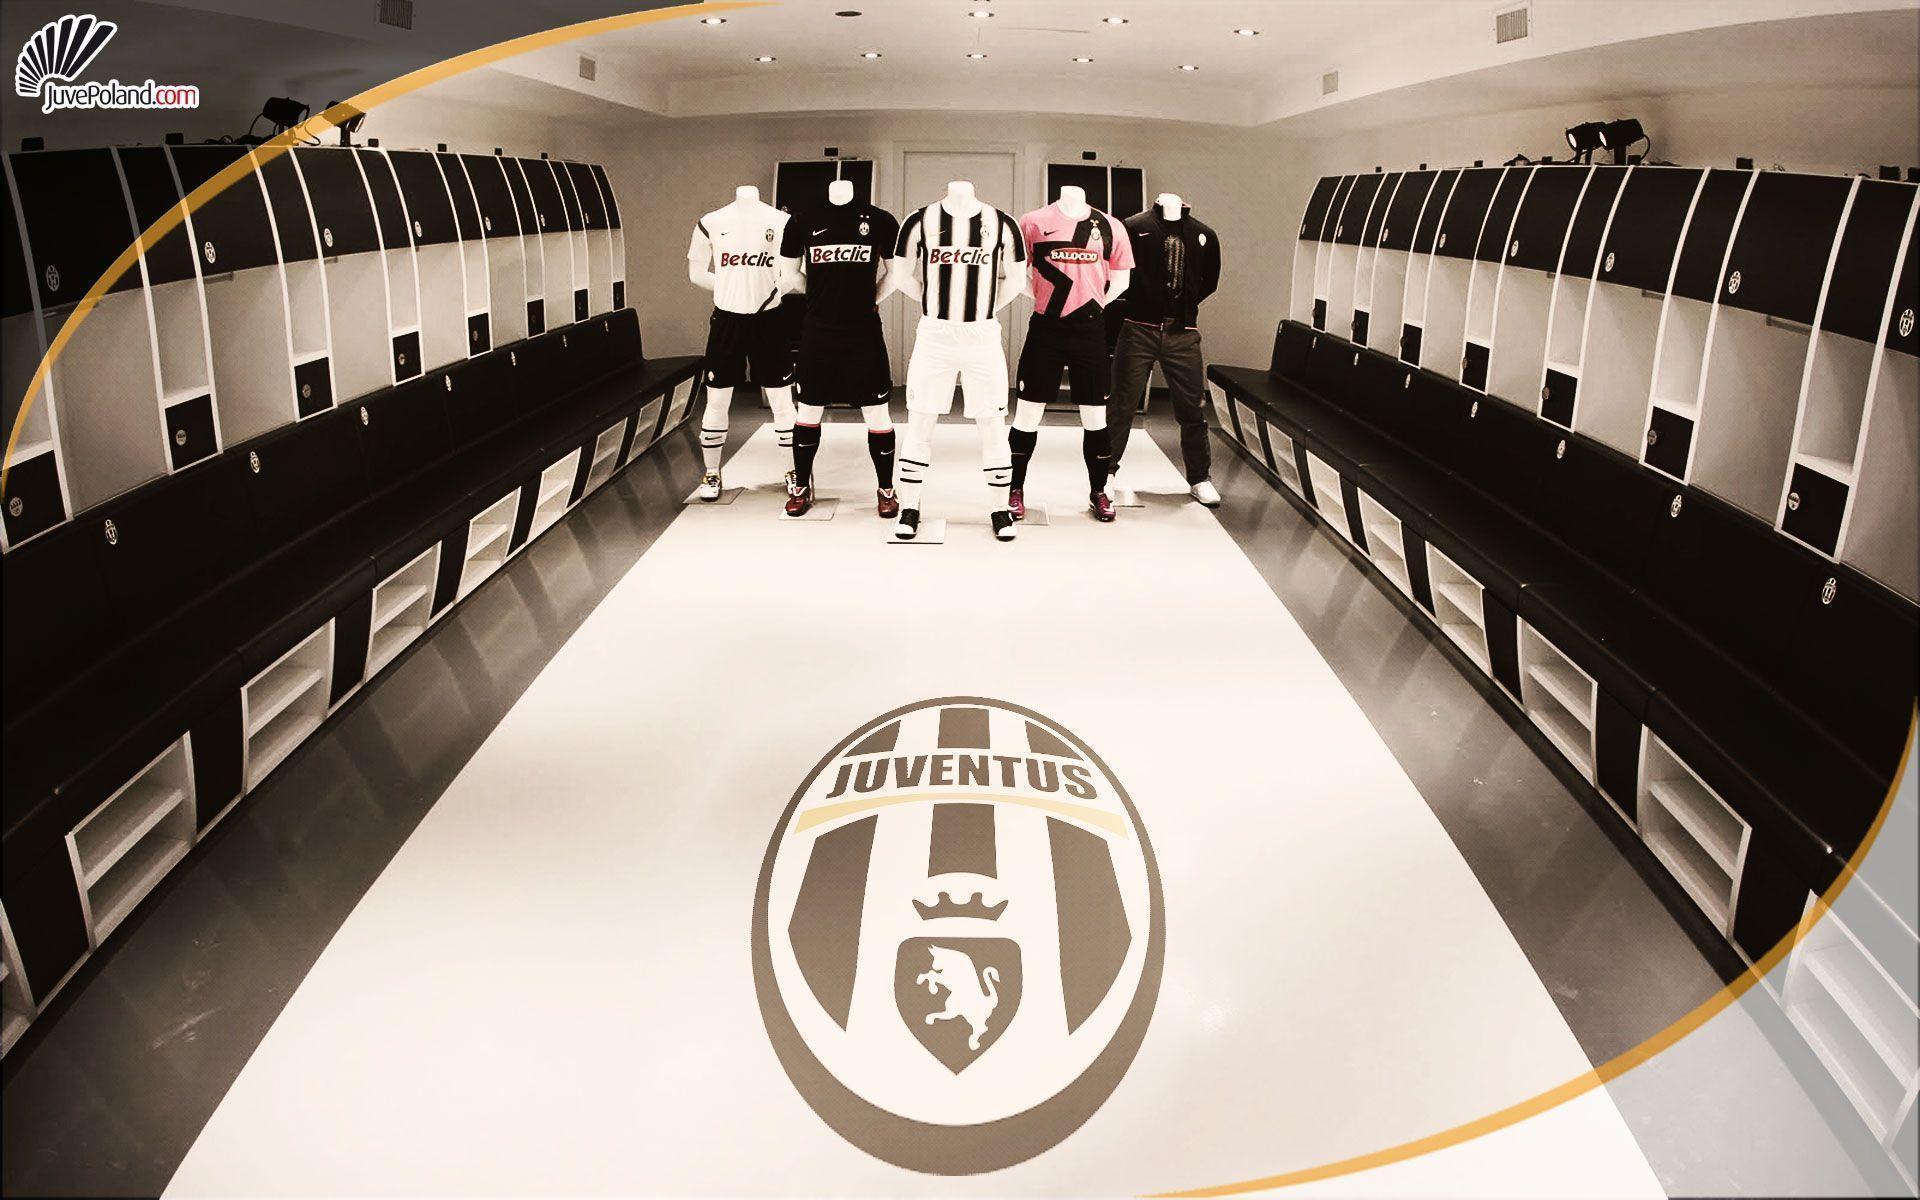 Juventus Wallpapers - Full HD wallpaper search